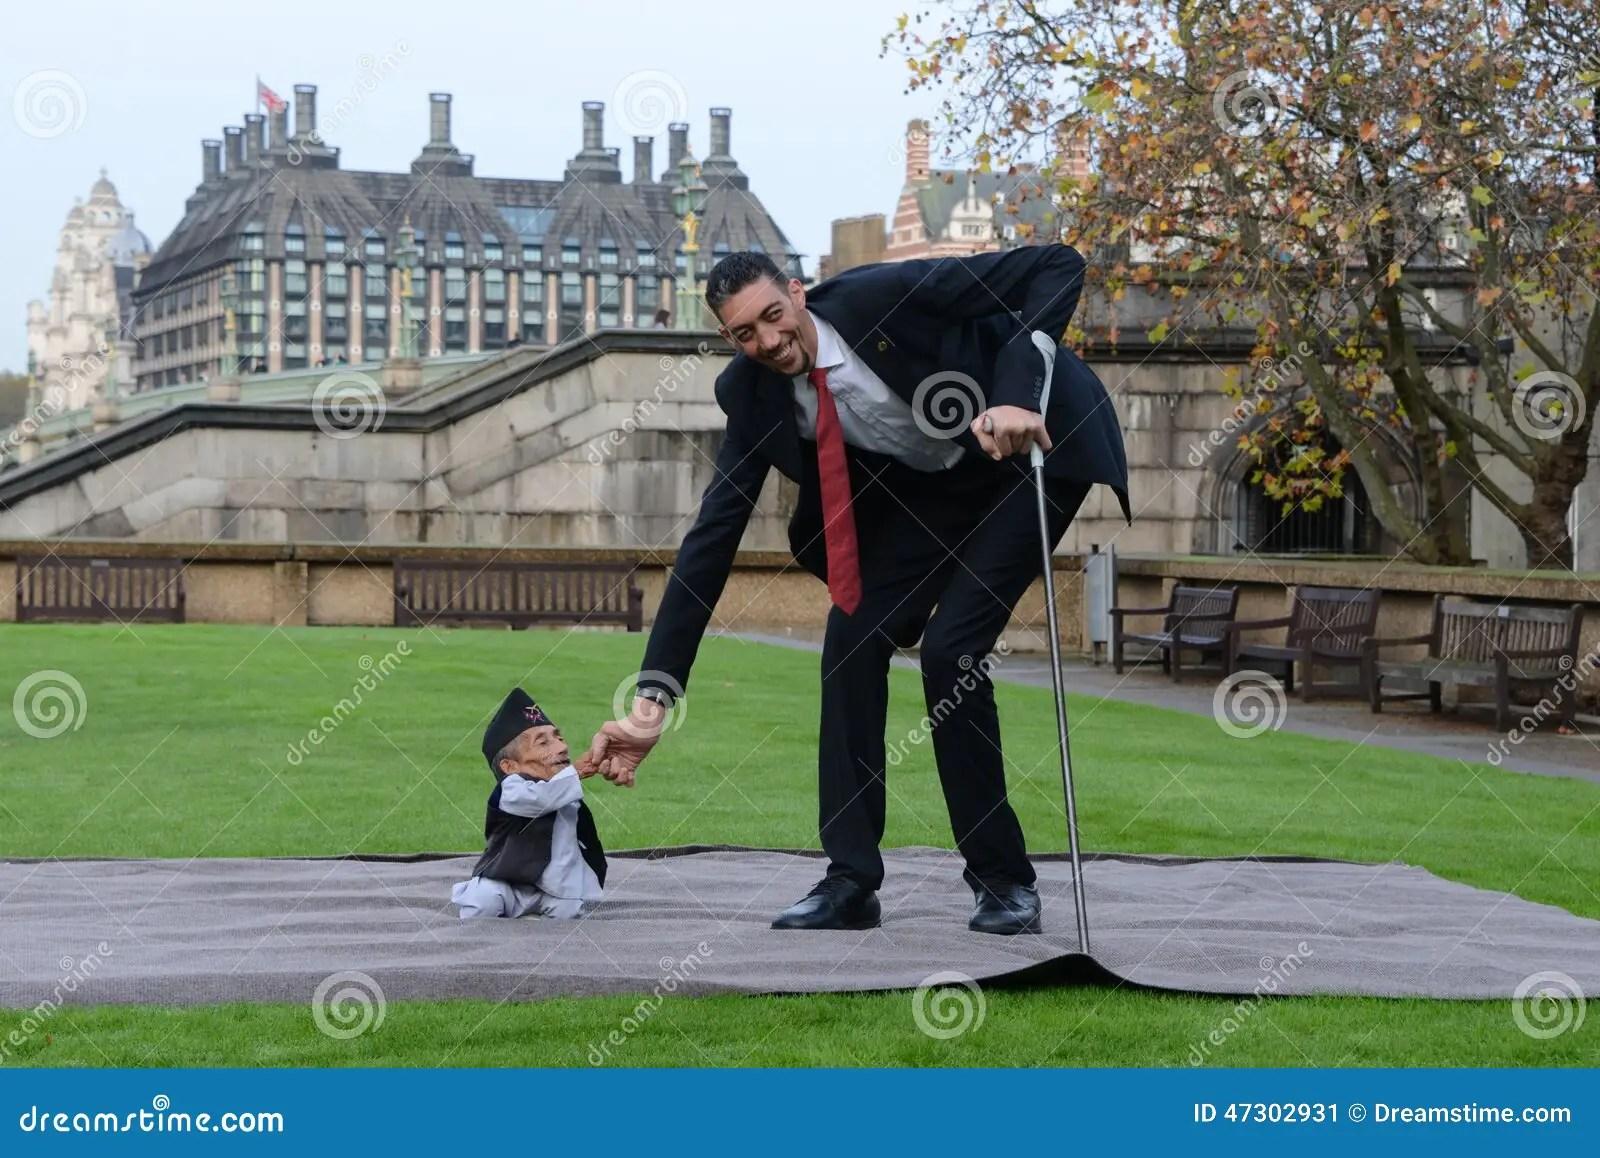 London World S Tallest Man And Shortest Man Meet On